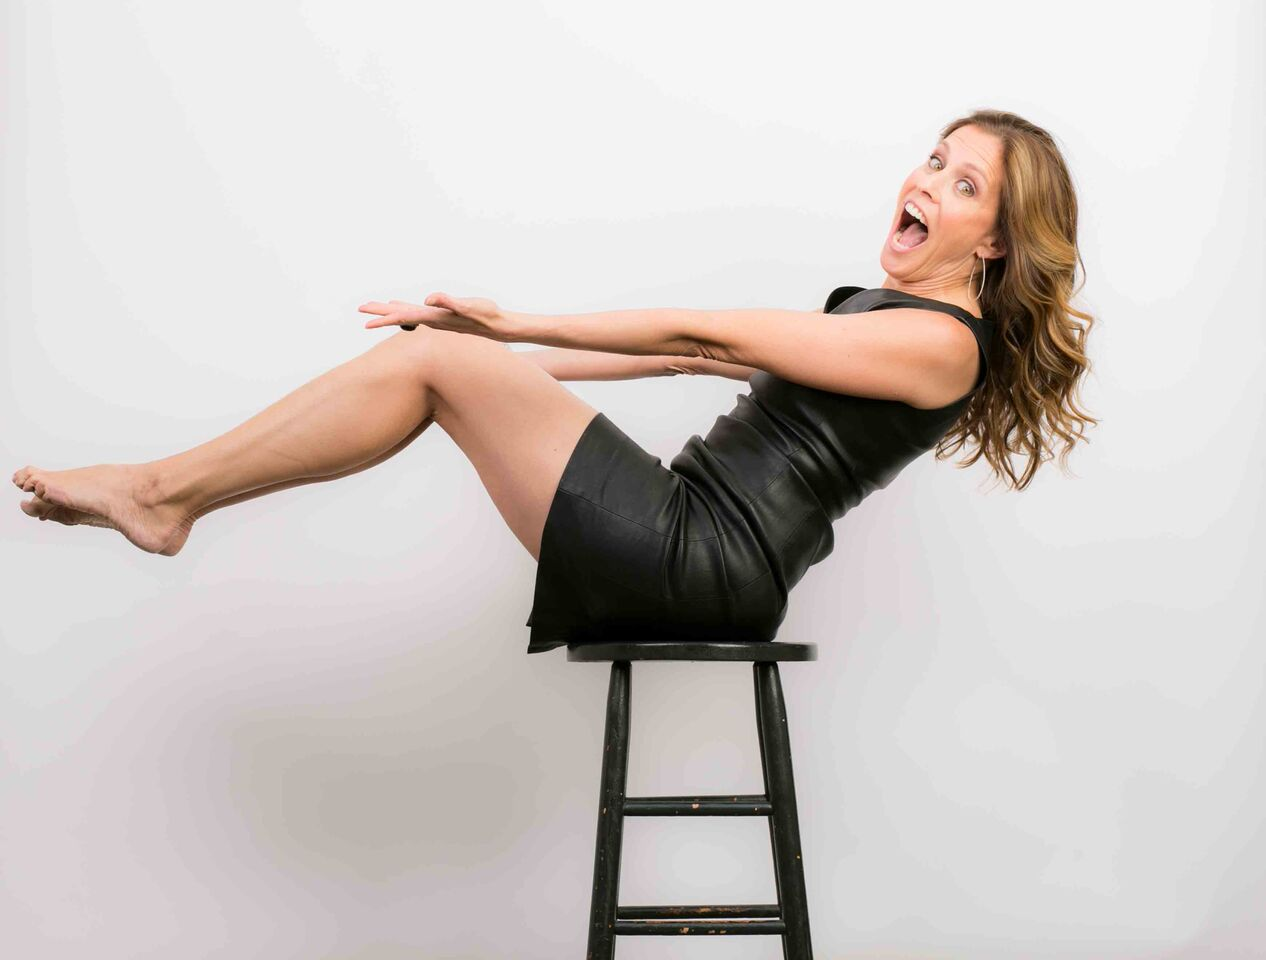 Felicia-Madison-comedian-1.jpg